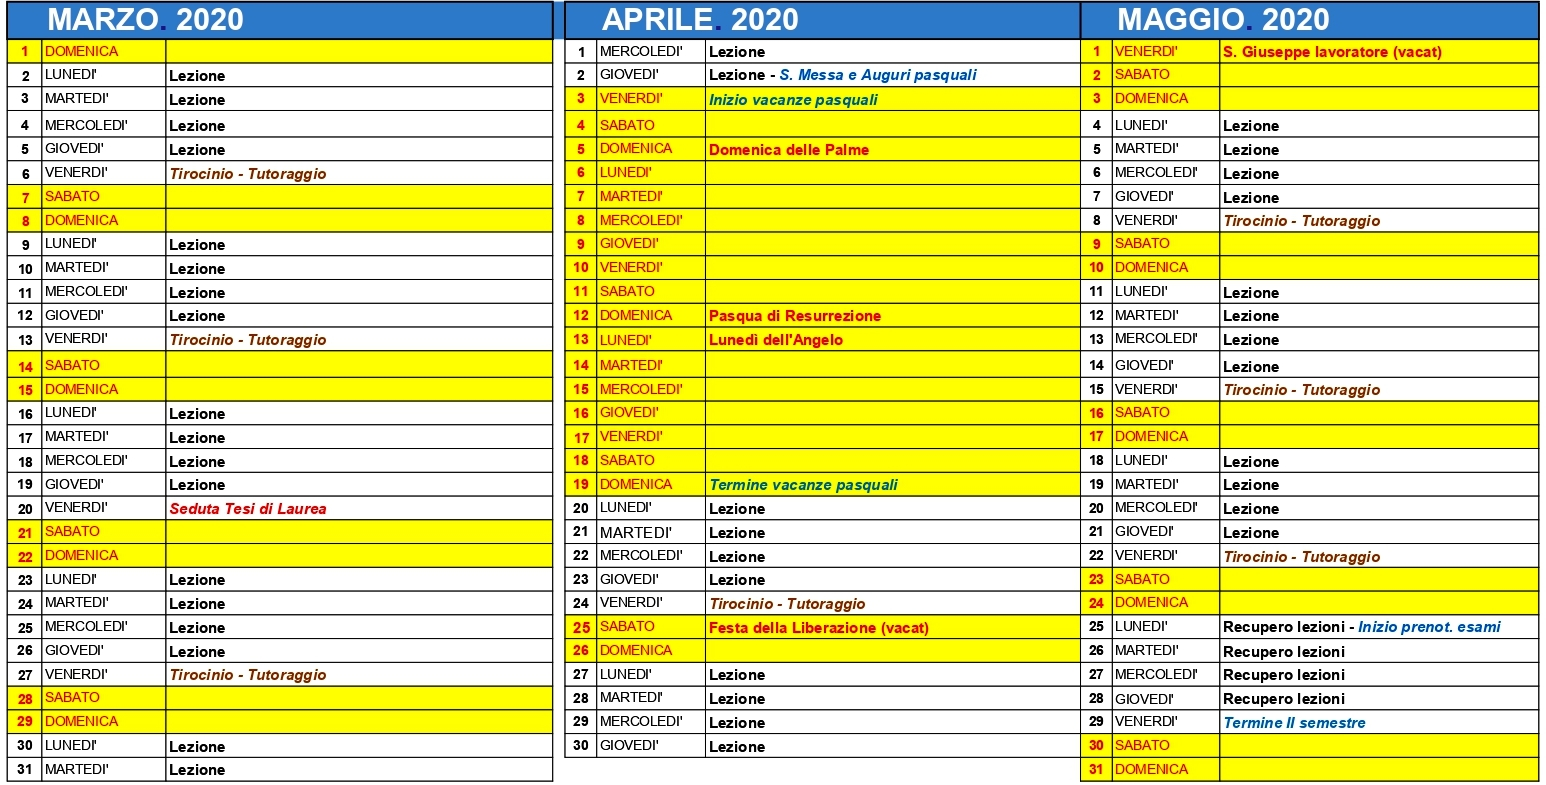 Calendario Religioso 2020.Calendario Accademico Istituto Superiore Di Scienze